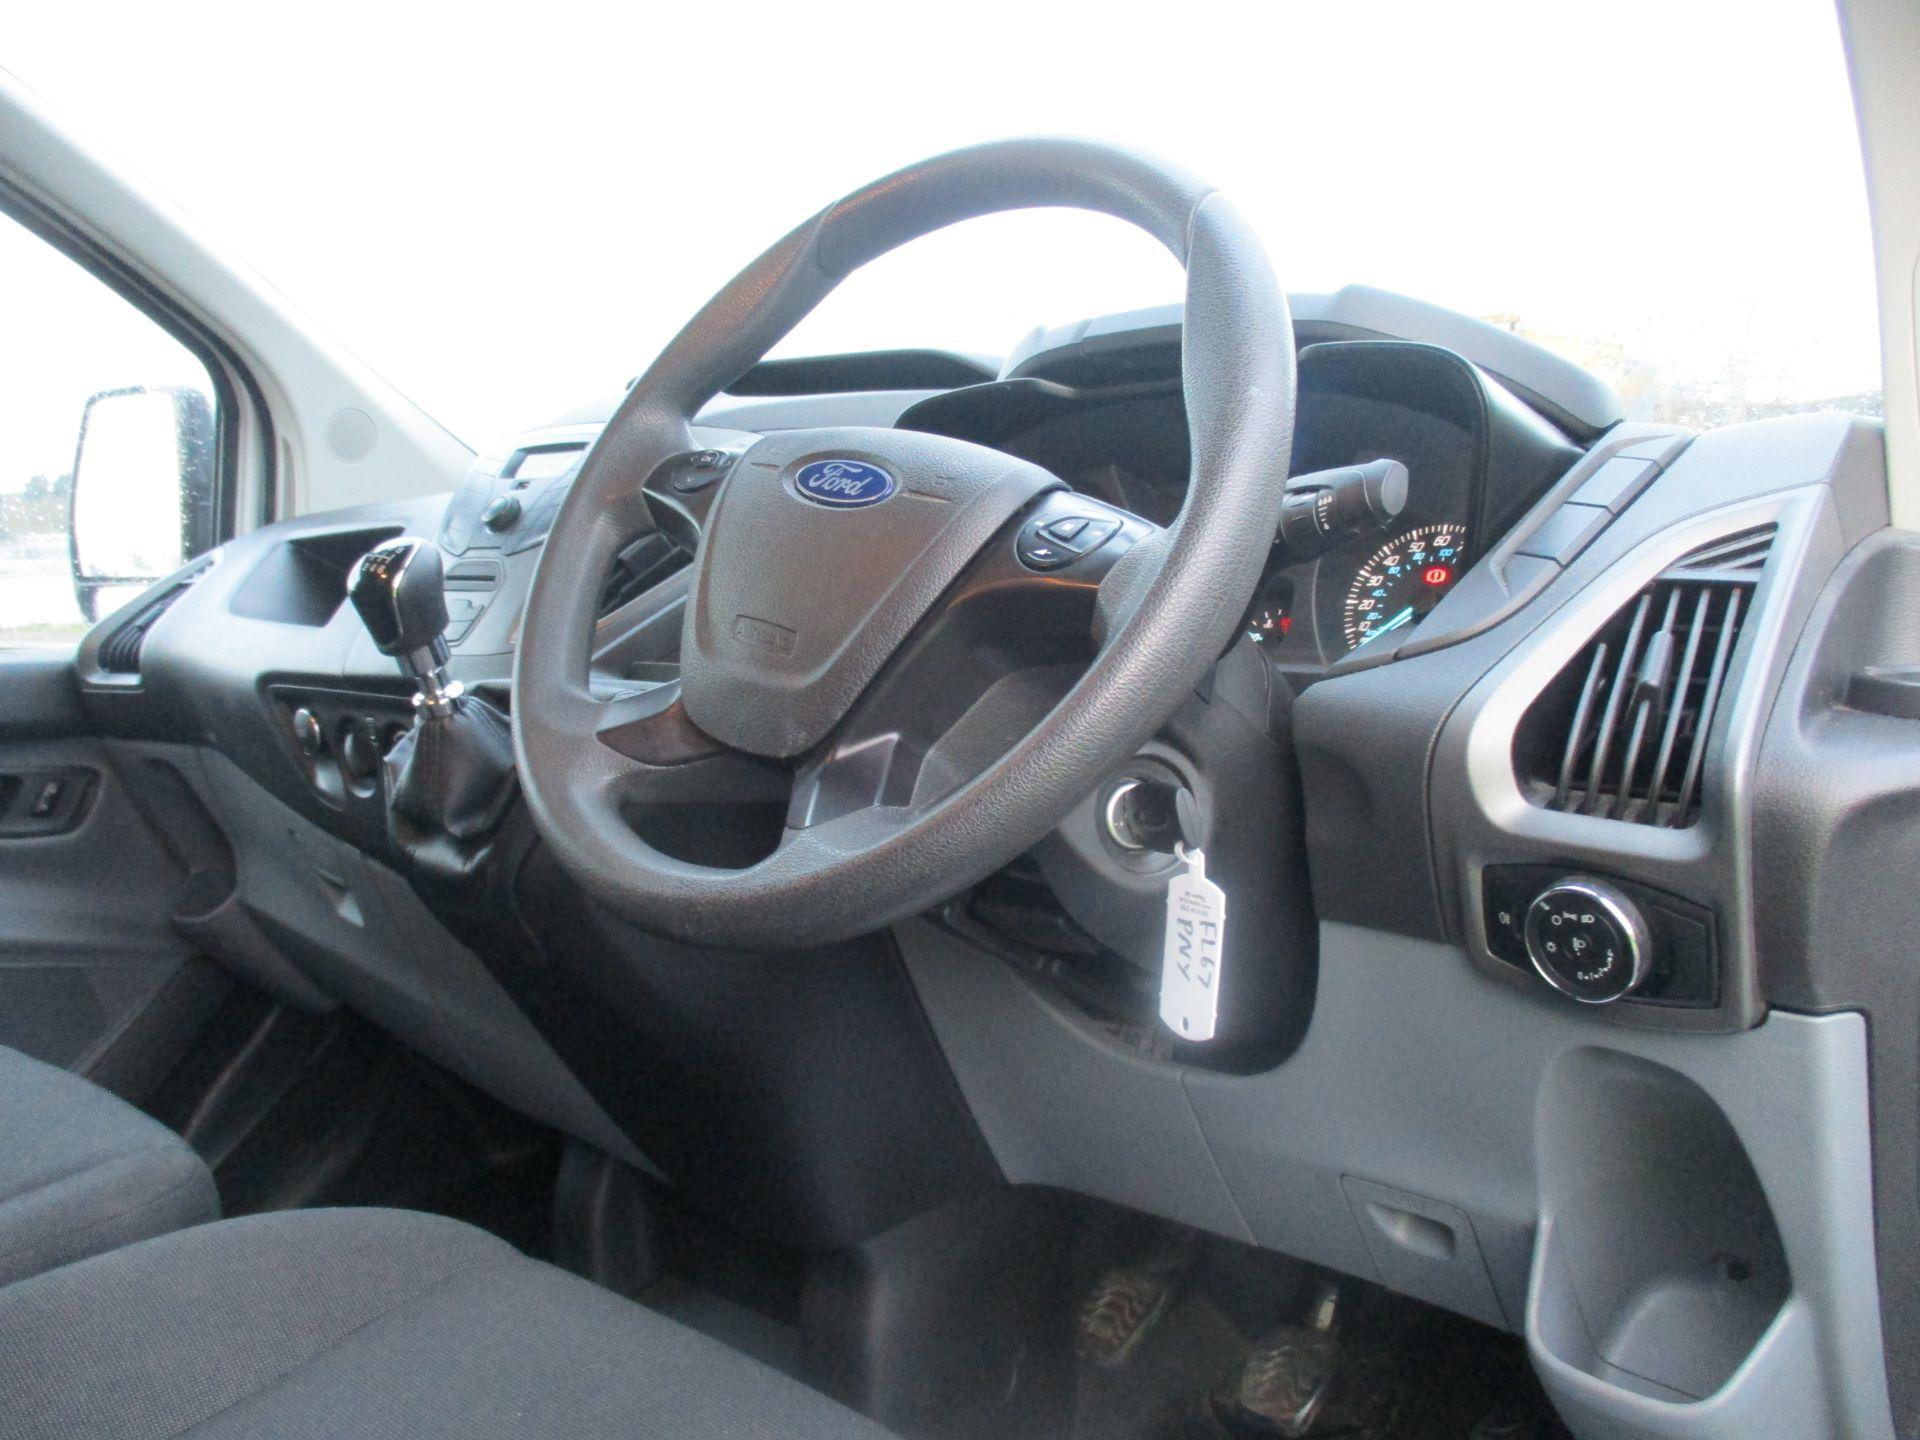 2017 Ford Transit Custom 290 L1 DIESEL FWD 2.0 TDCI 105PS LOW ROOF VAN EURO 6 (FL67PNY) Image 13